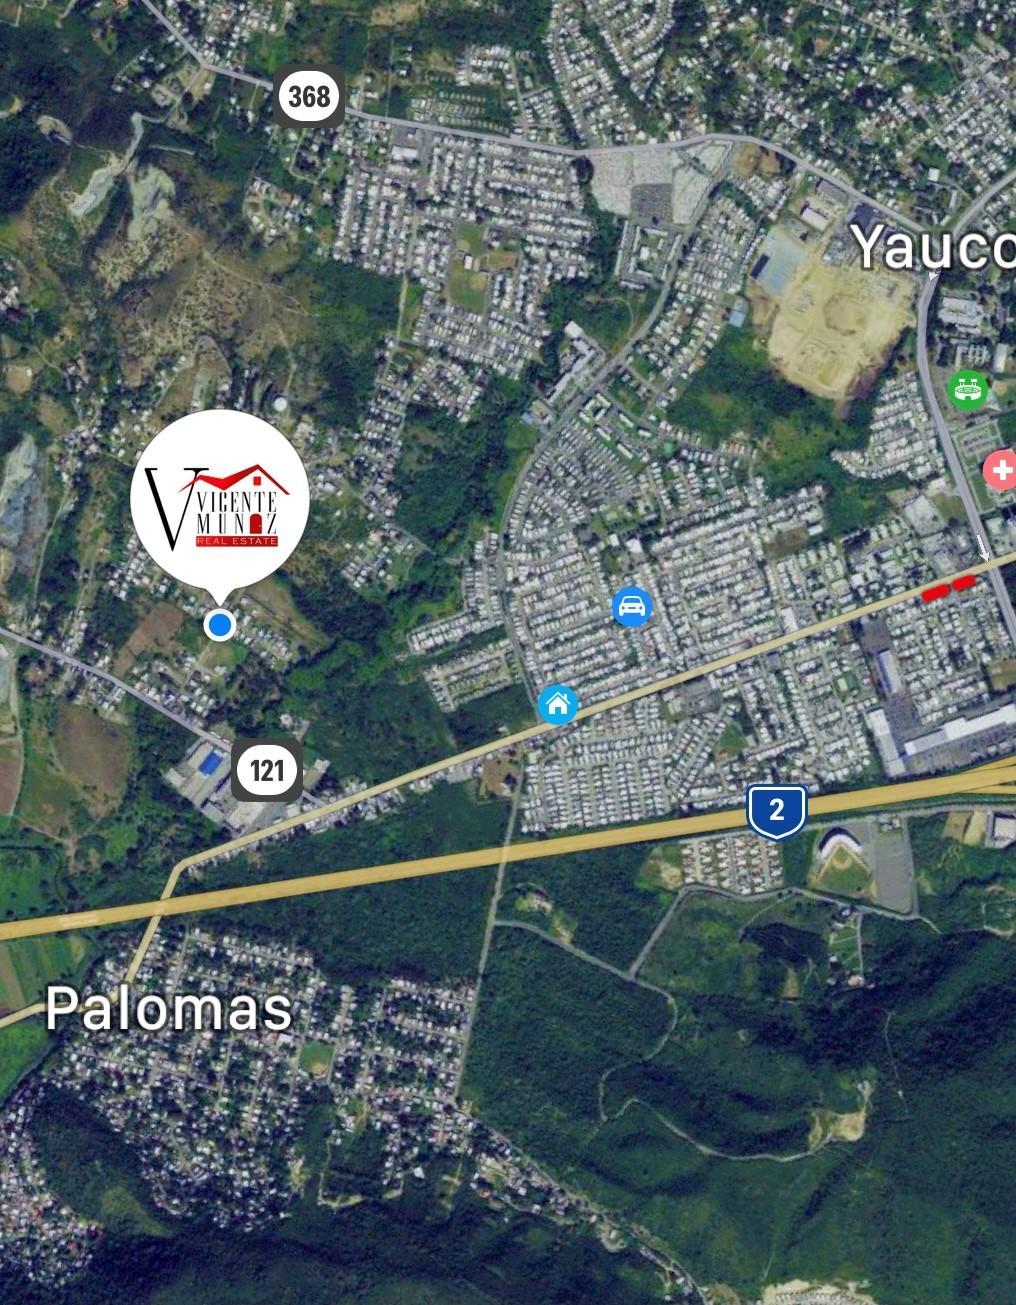 Calle 1 Urb. Hacienda Mariani Yauco, PR 00698